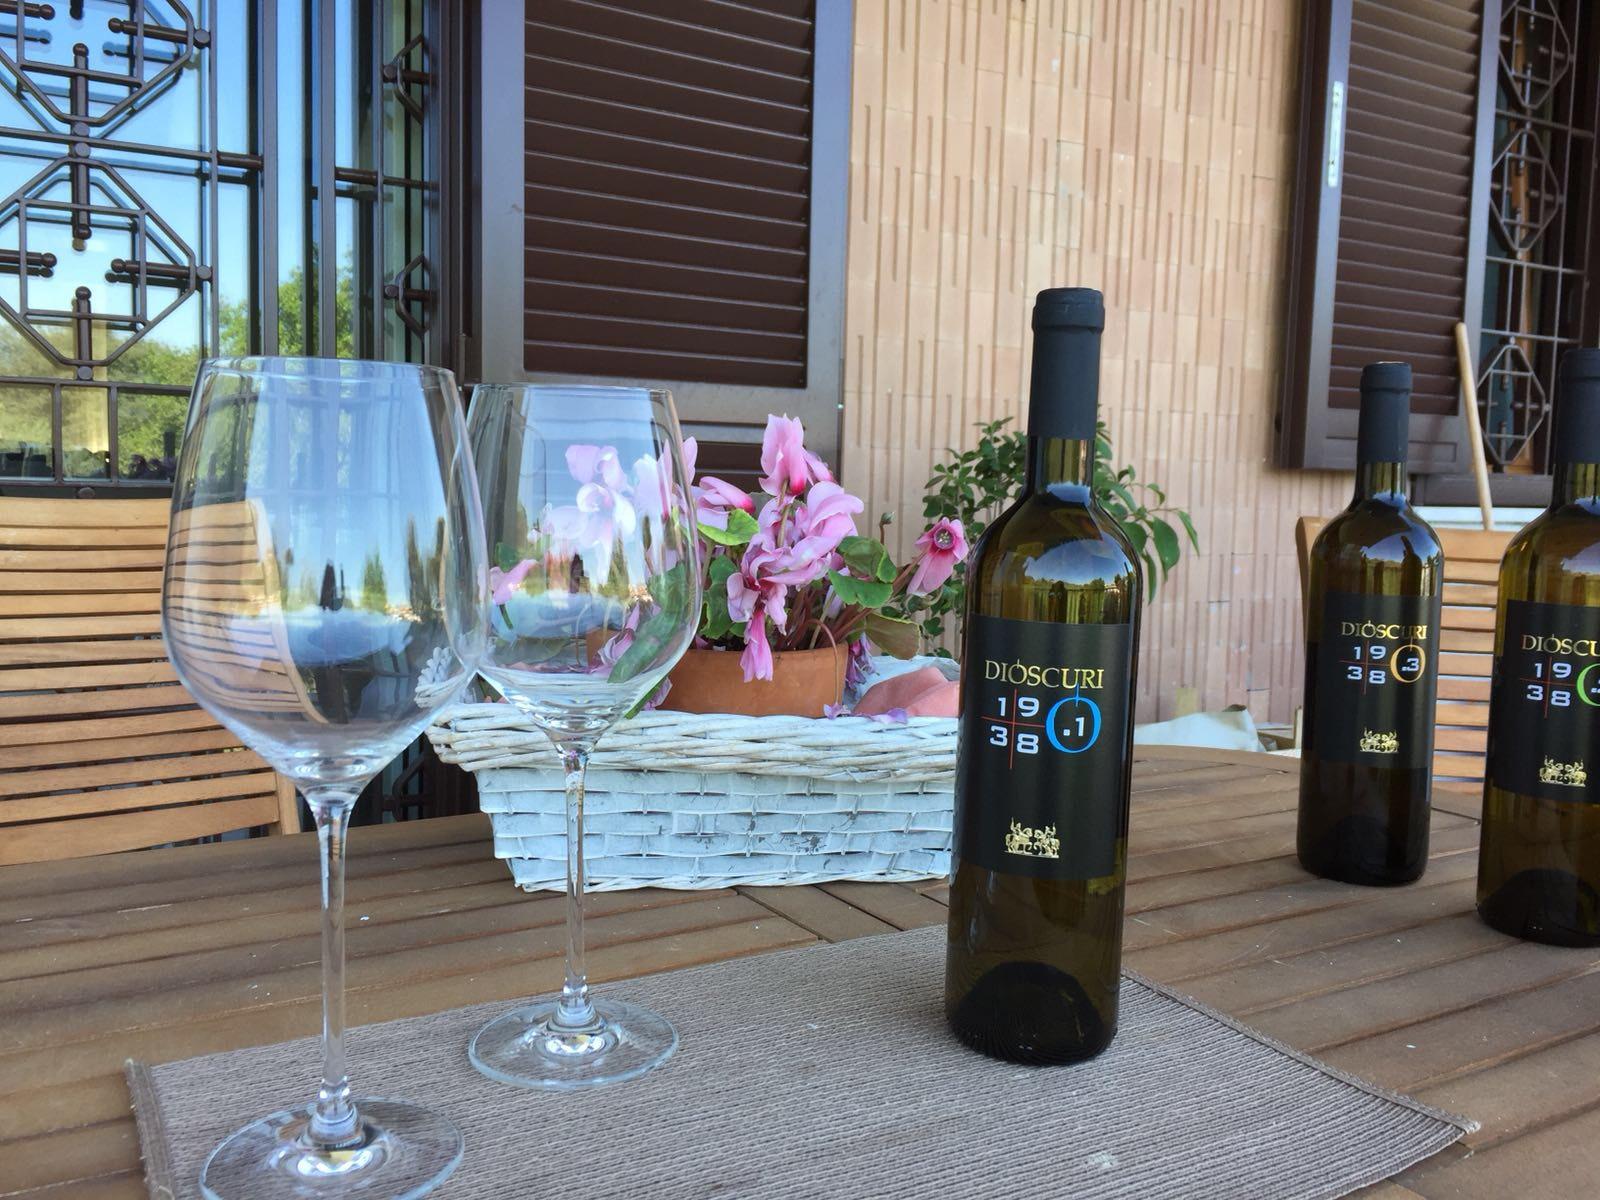 Falanghina by Dioscuri - Italian wines